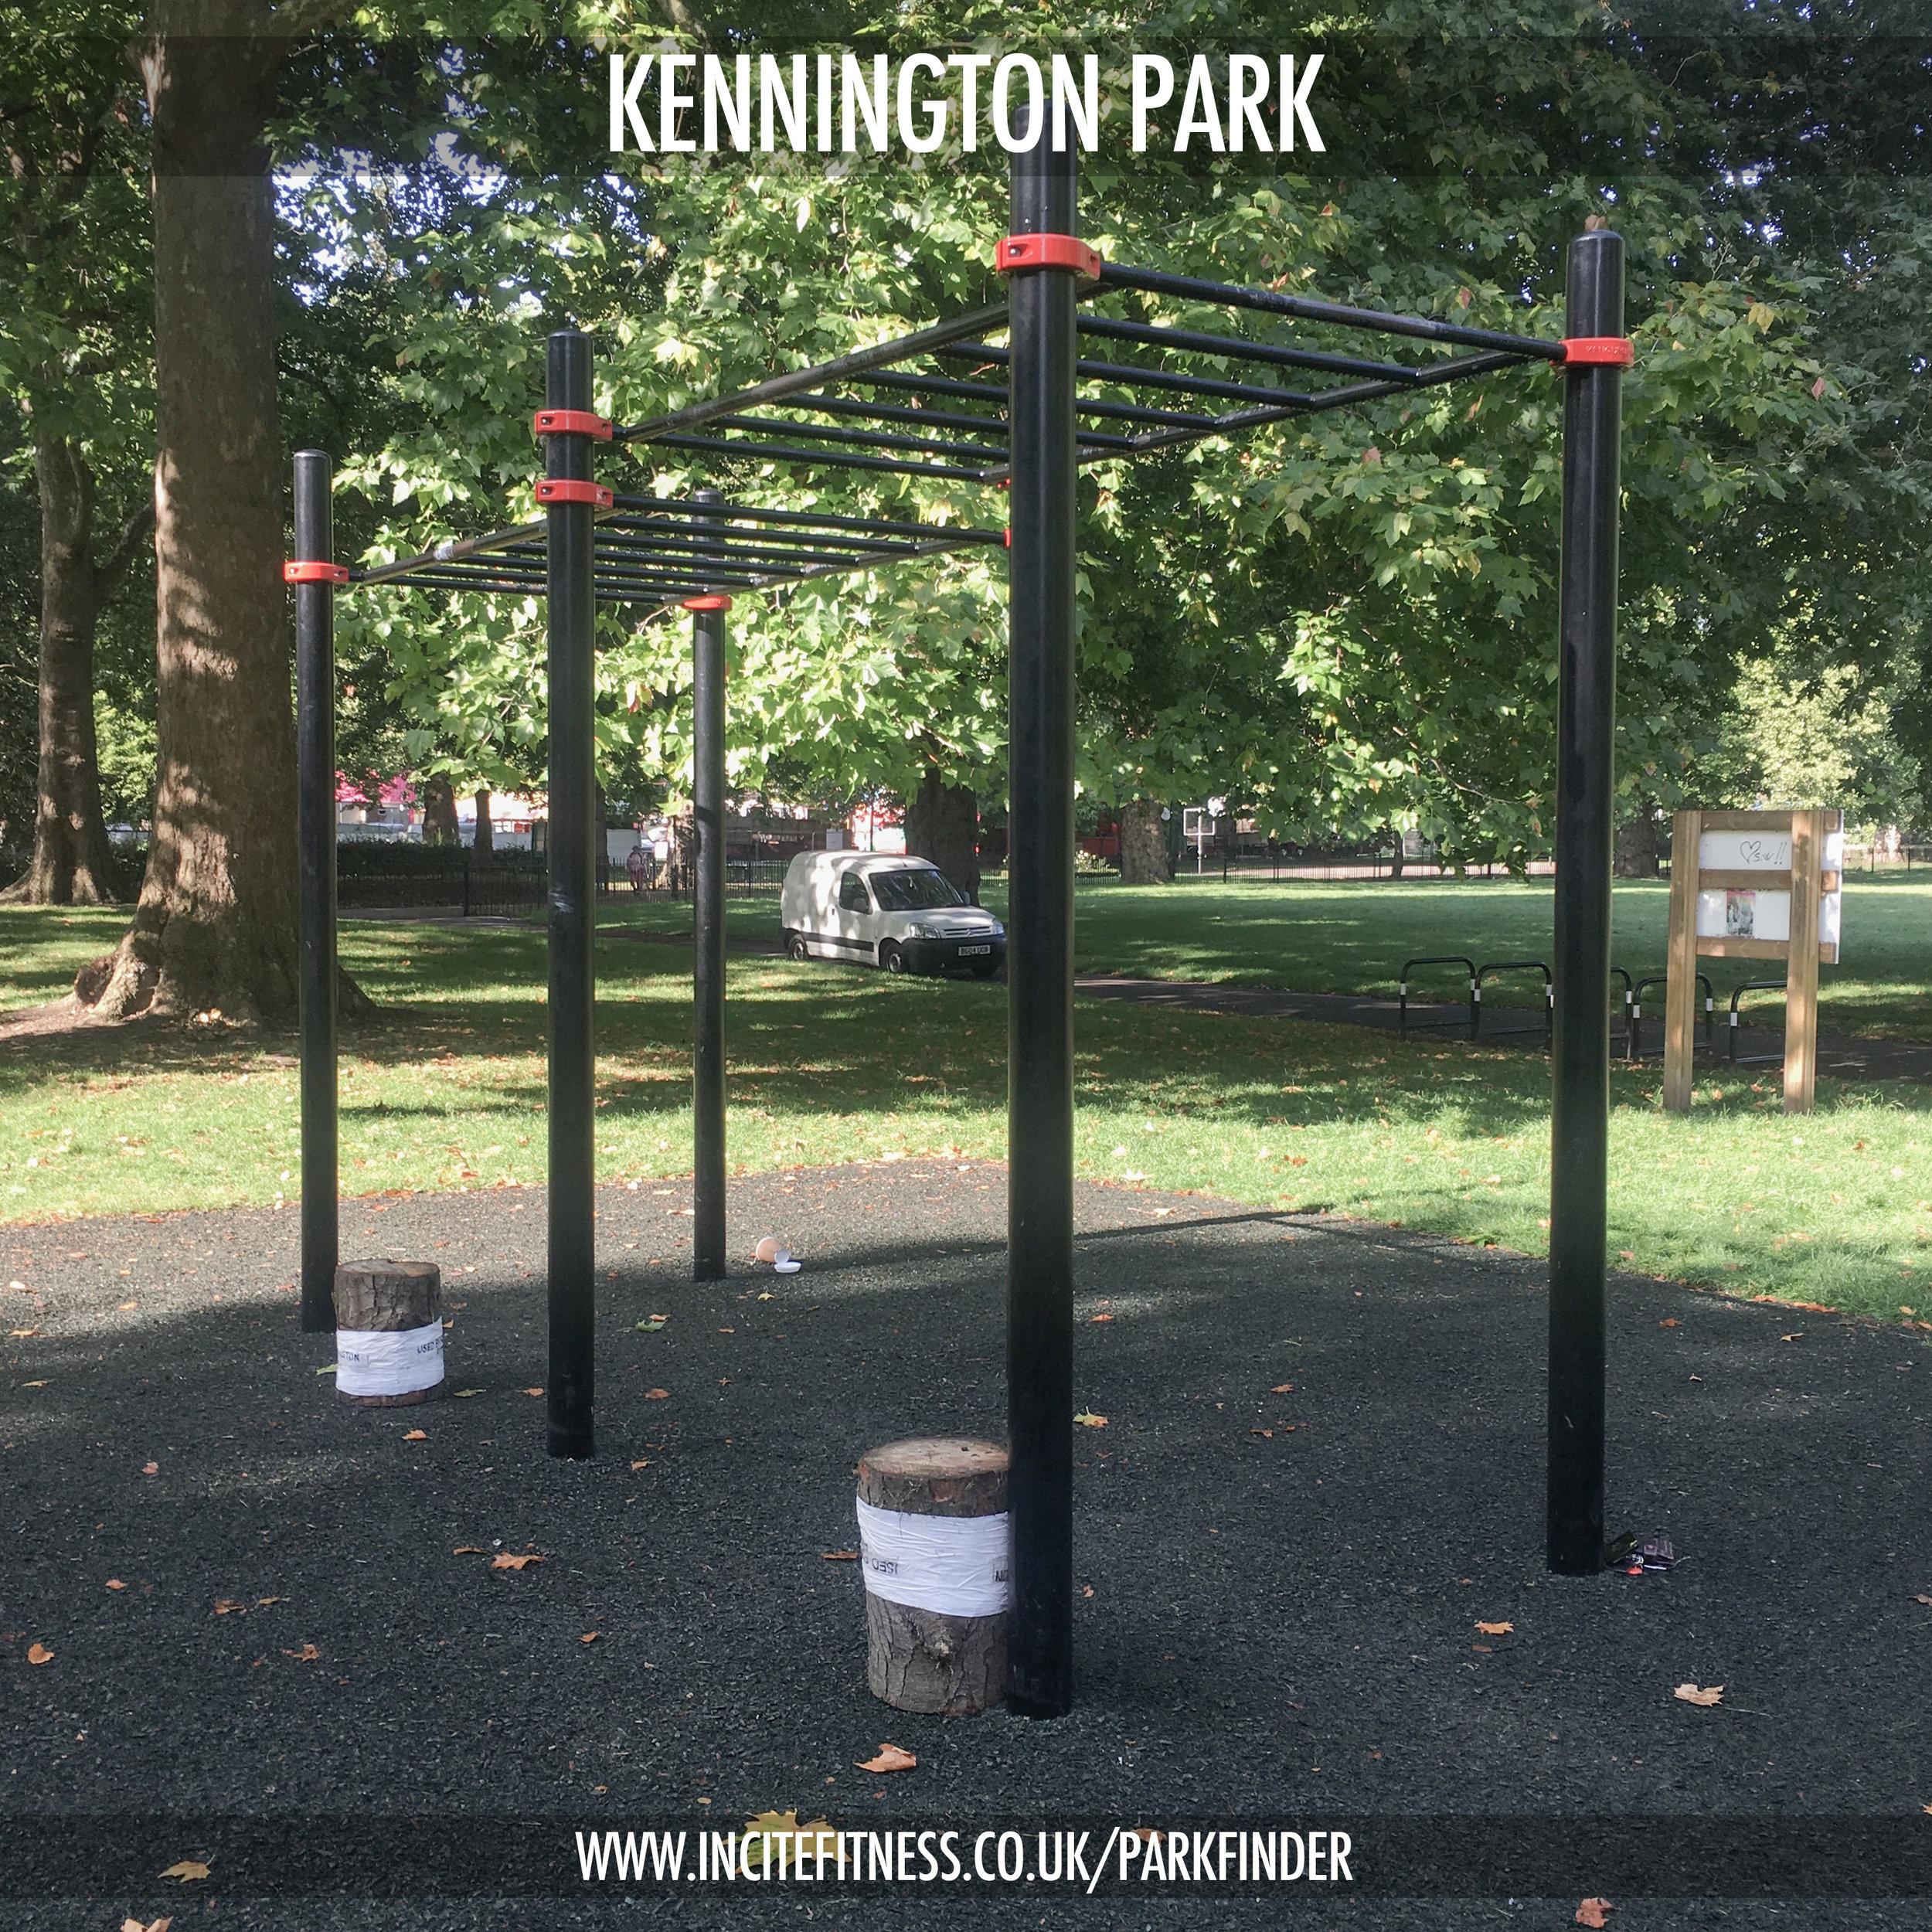 Kennington park 05 monkey bars.jpg